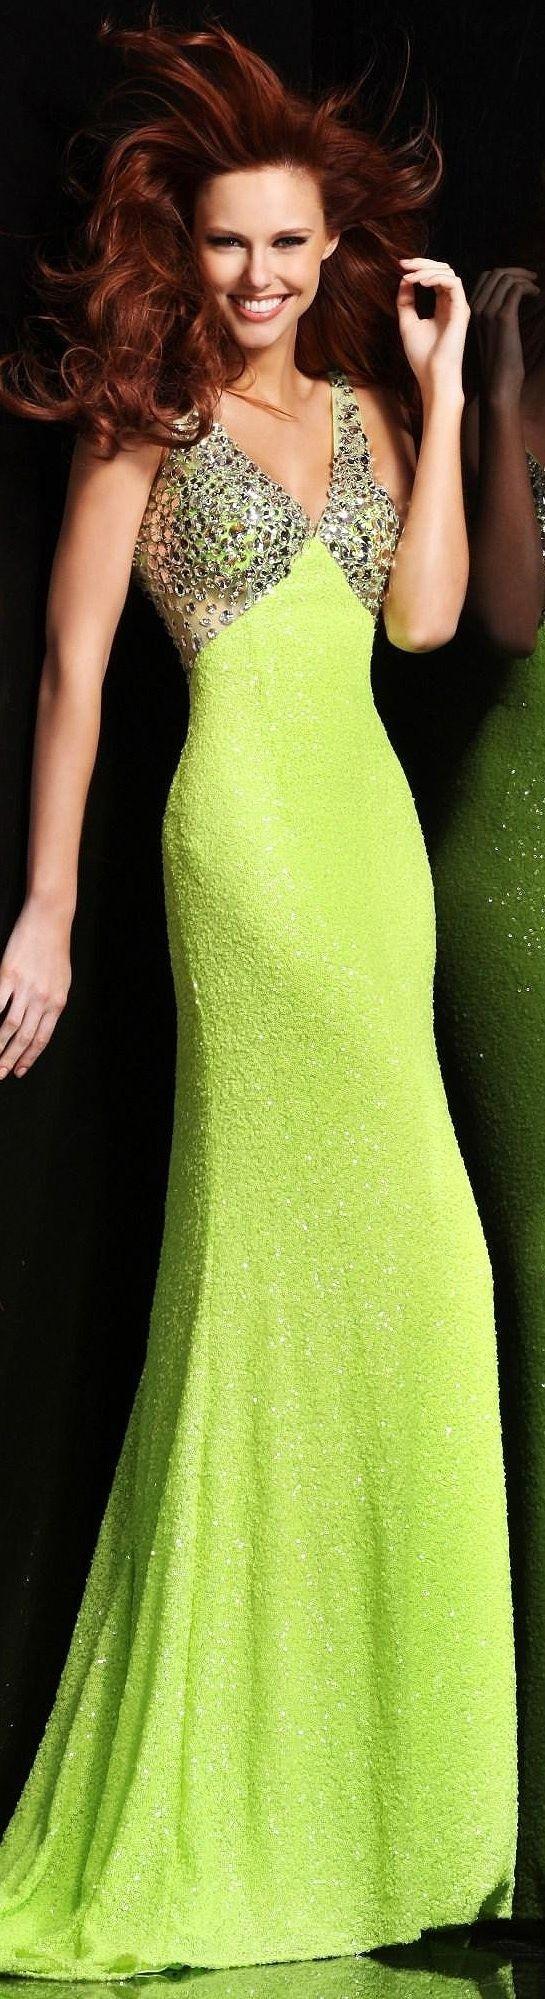 Color fashion Glam ... Neon dress